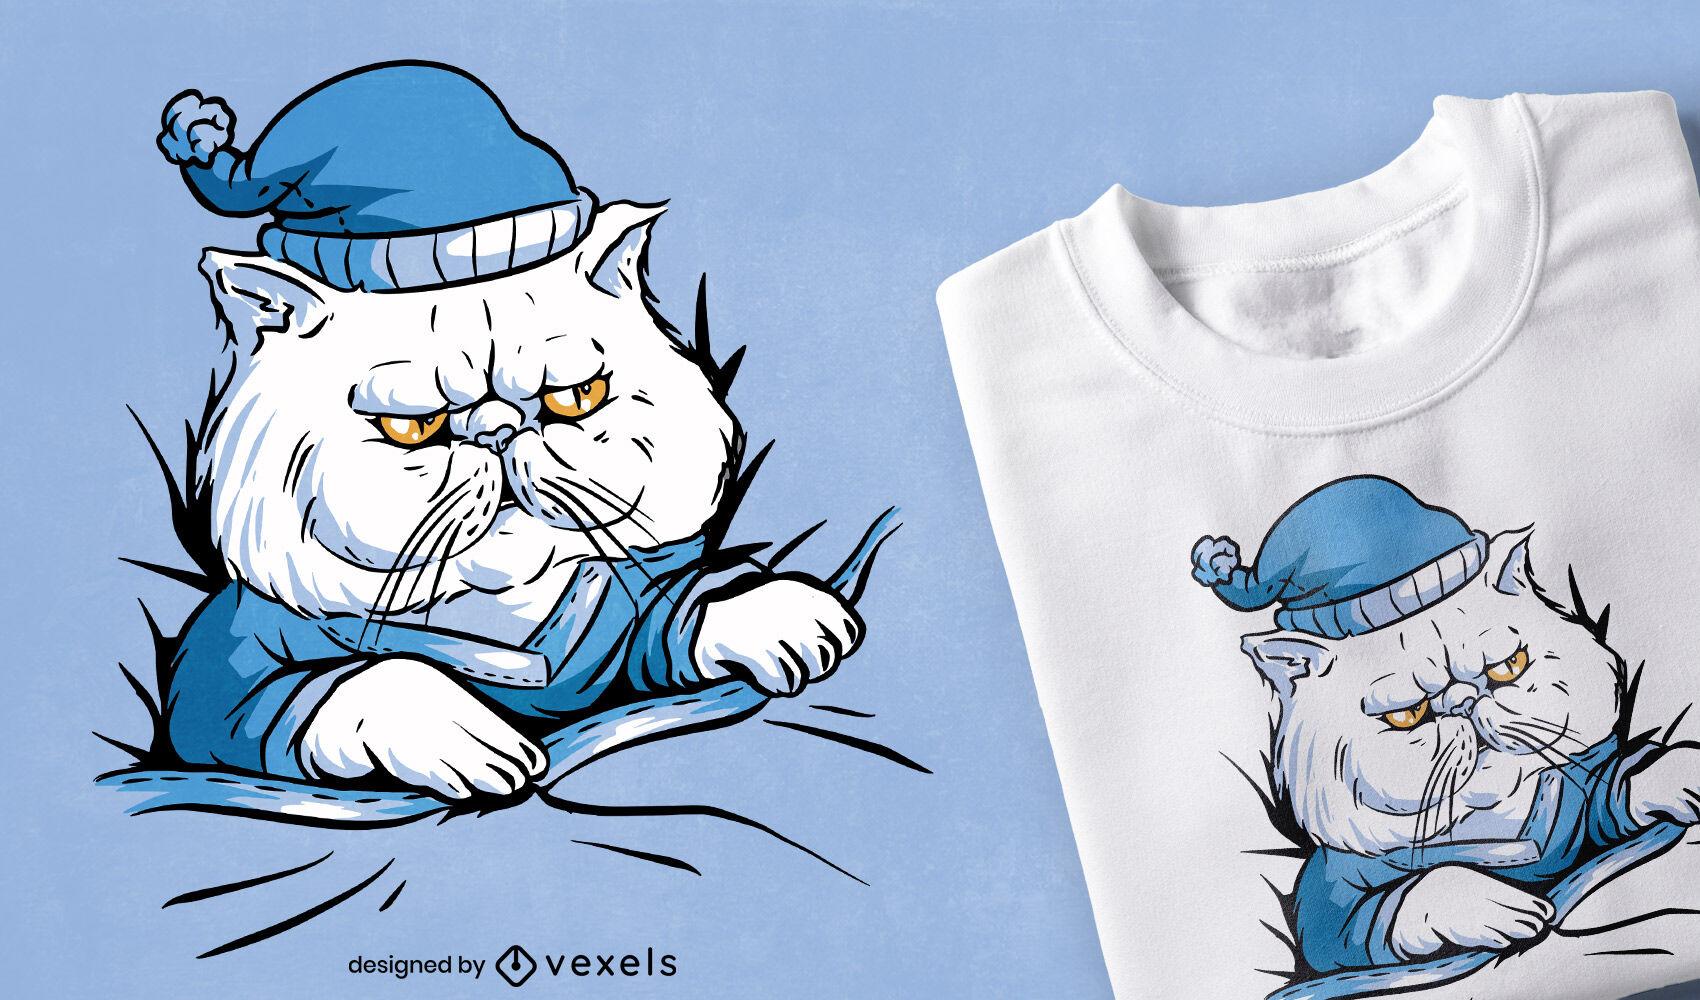 Animal gato soñoliento en diseño de camiseta de pijama